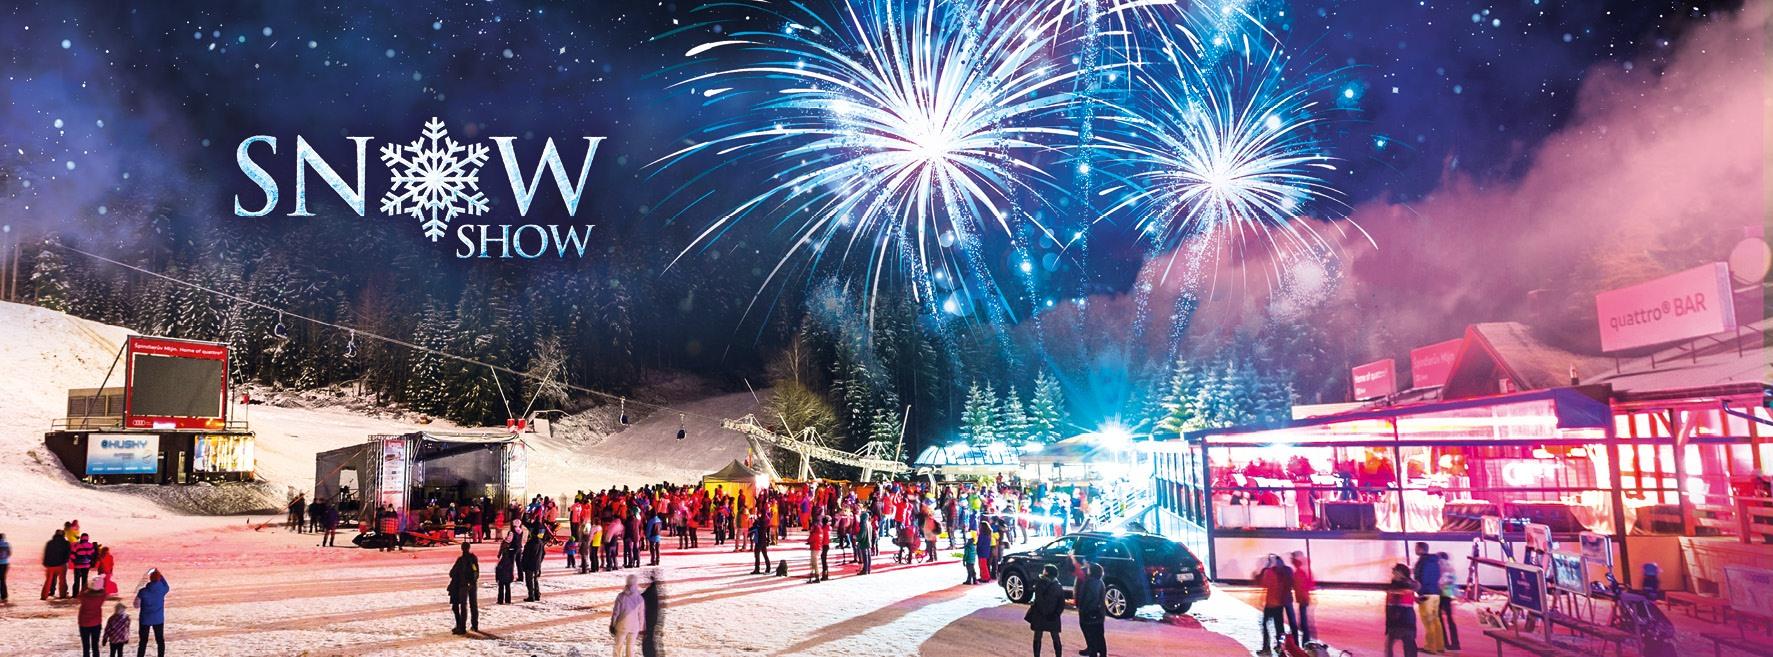 Špindlerův Mlýn – SNOW SHOW 16.2. / 23.2.